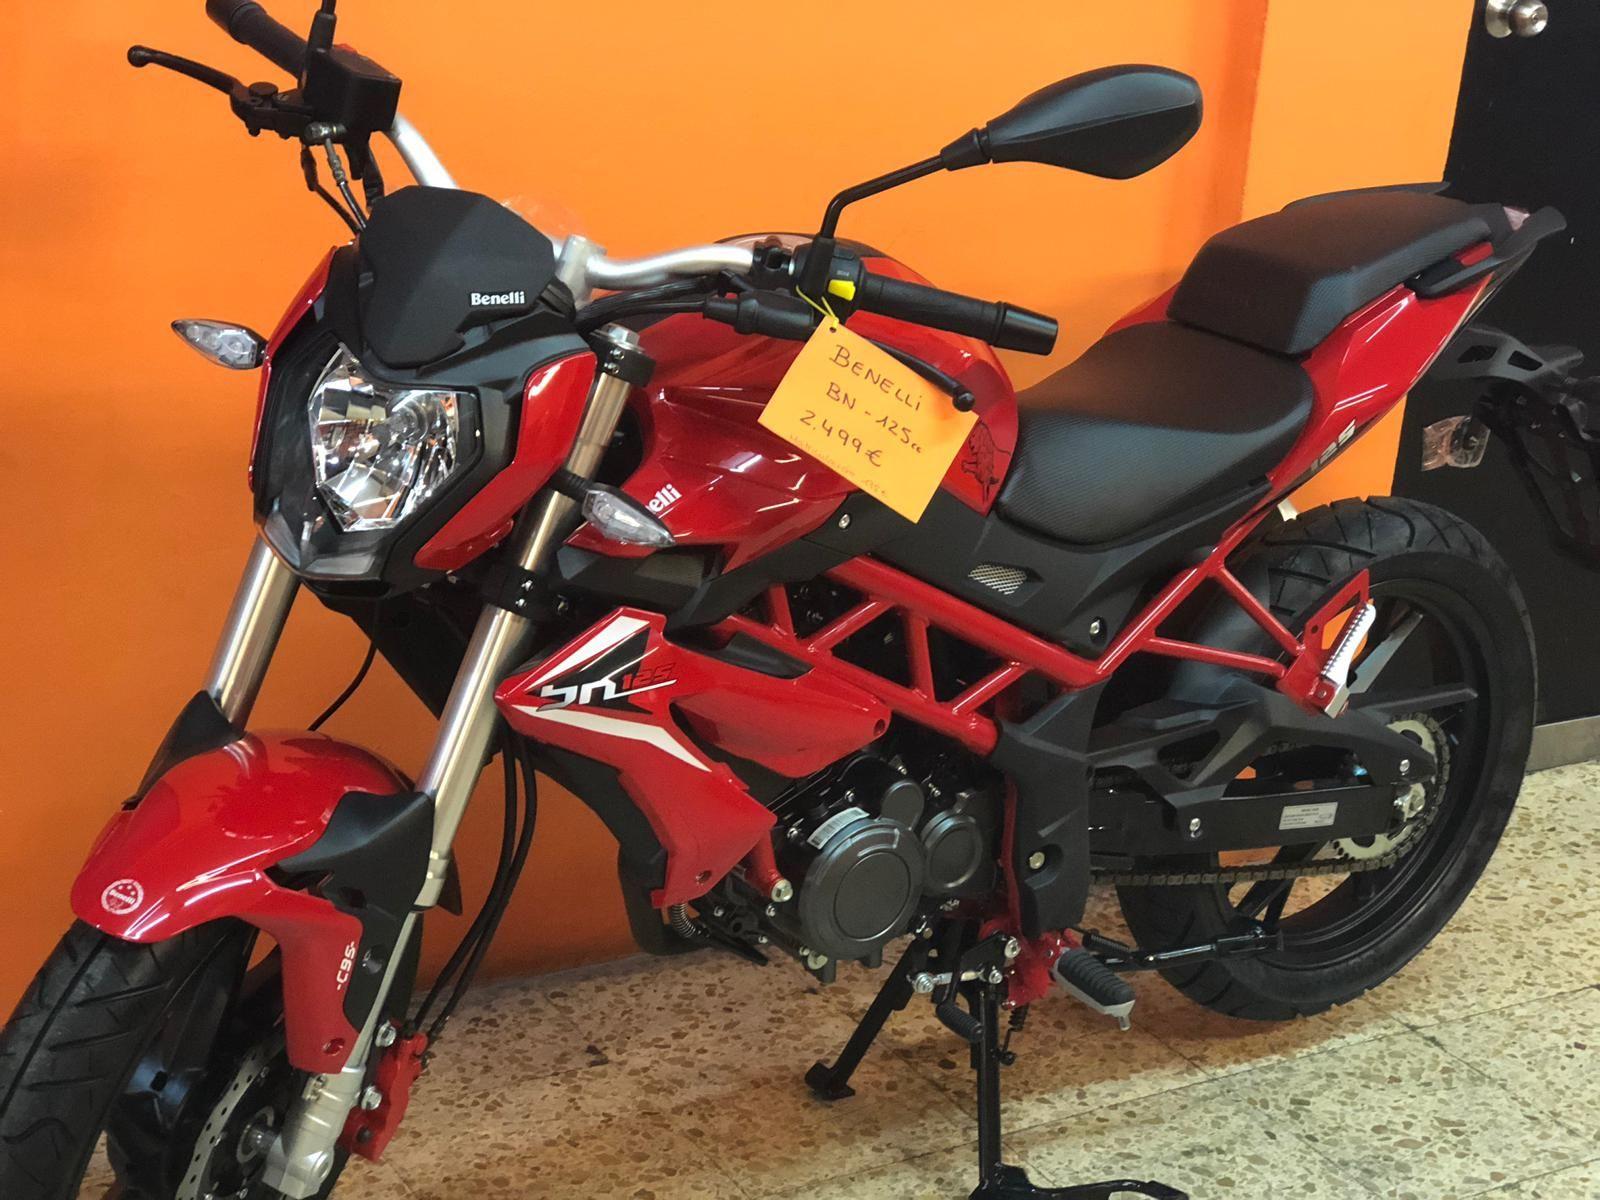 Dónde comprar motos Lleida